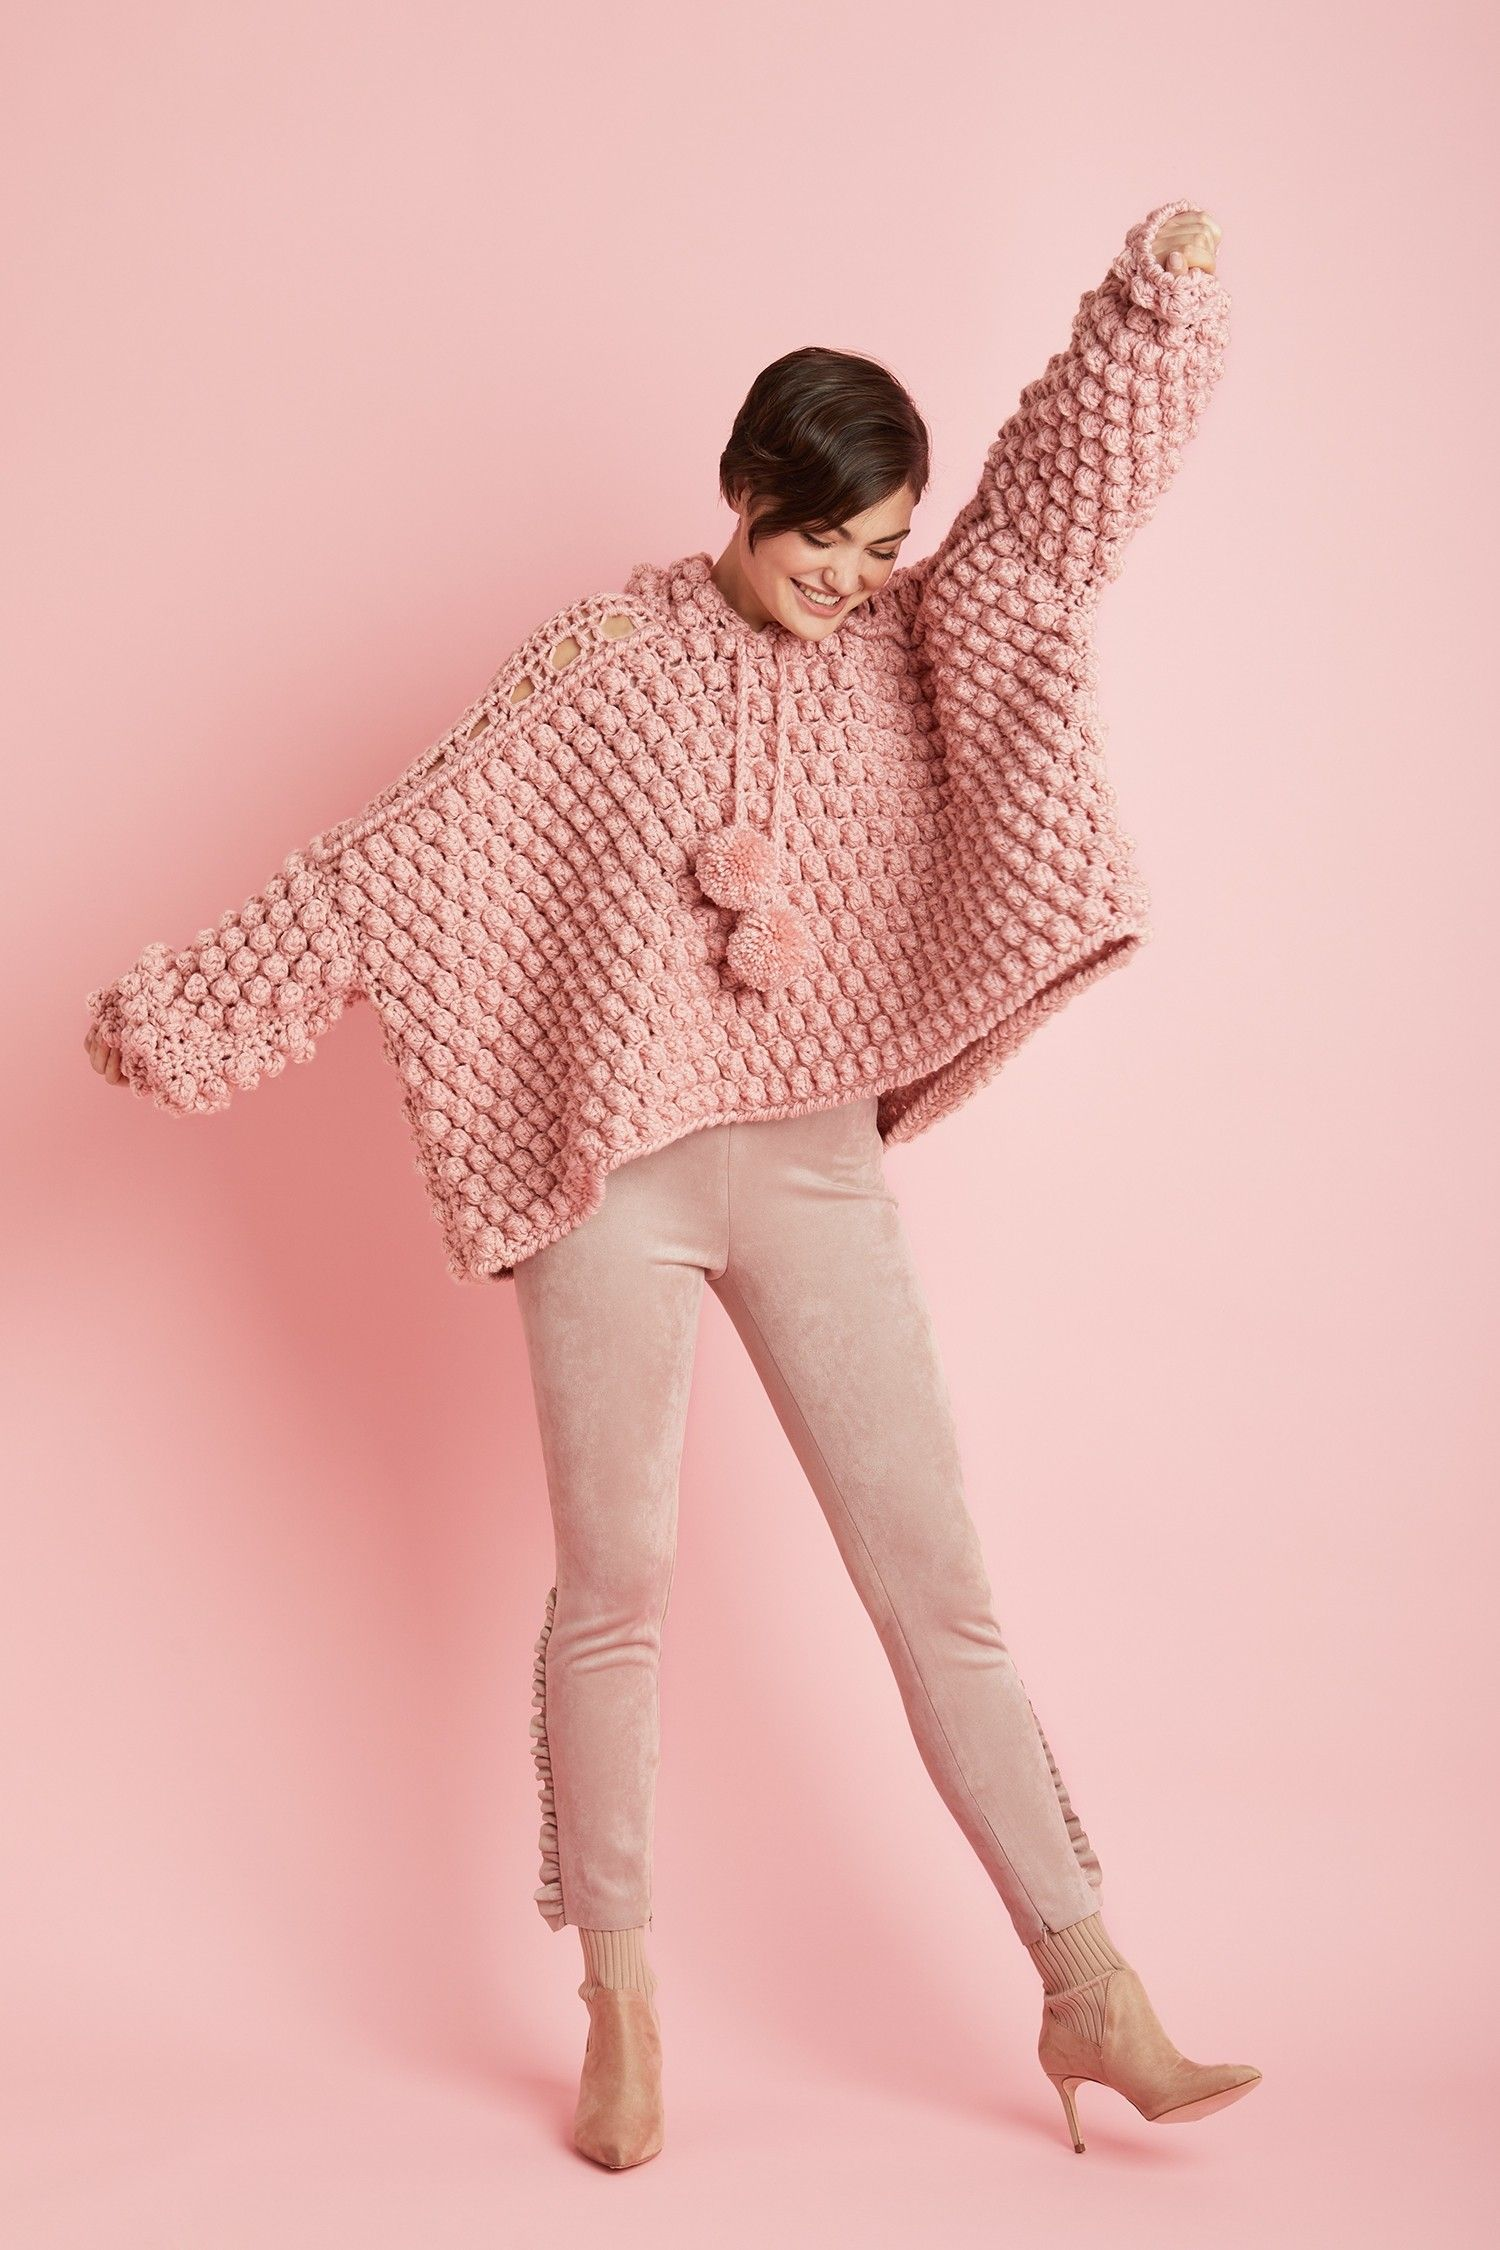 Best Easy Pink Wearables Free Patterns Roundup #crochettunicpattern